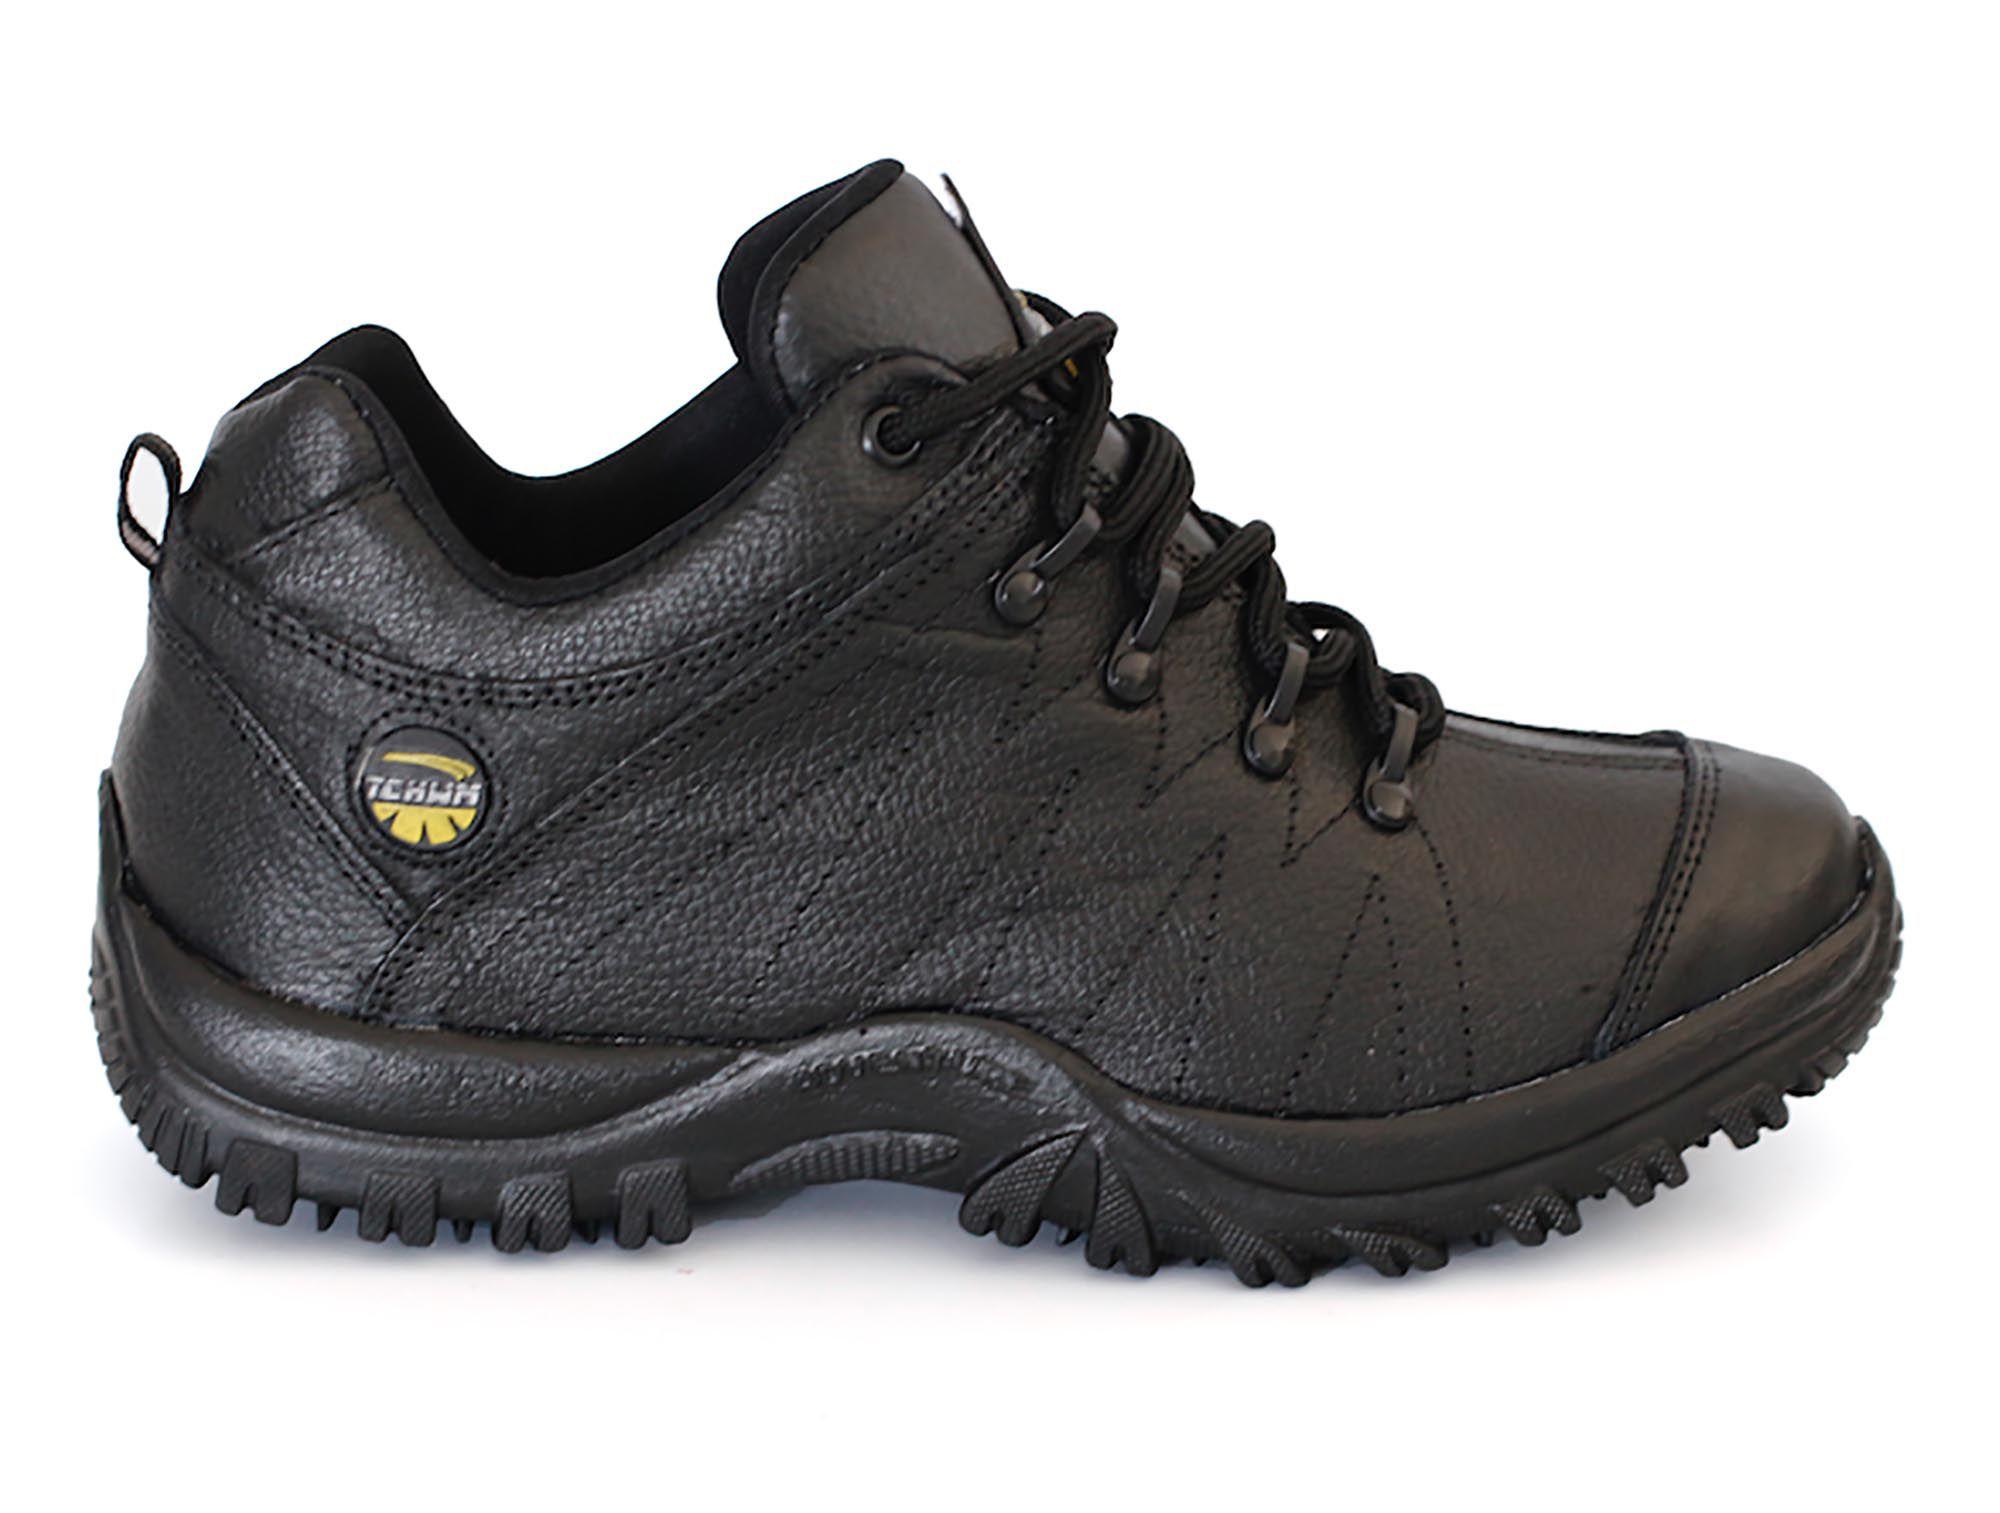 Tênis Adventure Cano Masculino Tchwm Shoes Couro Floter - Preto